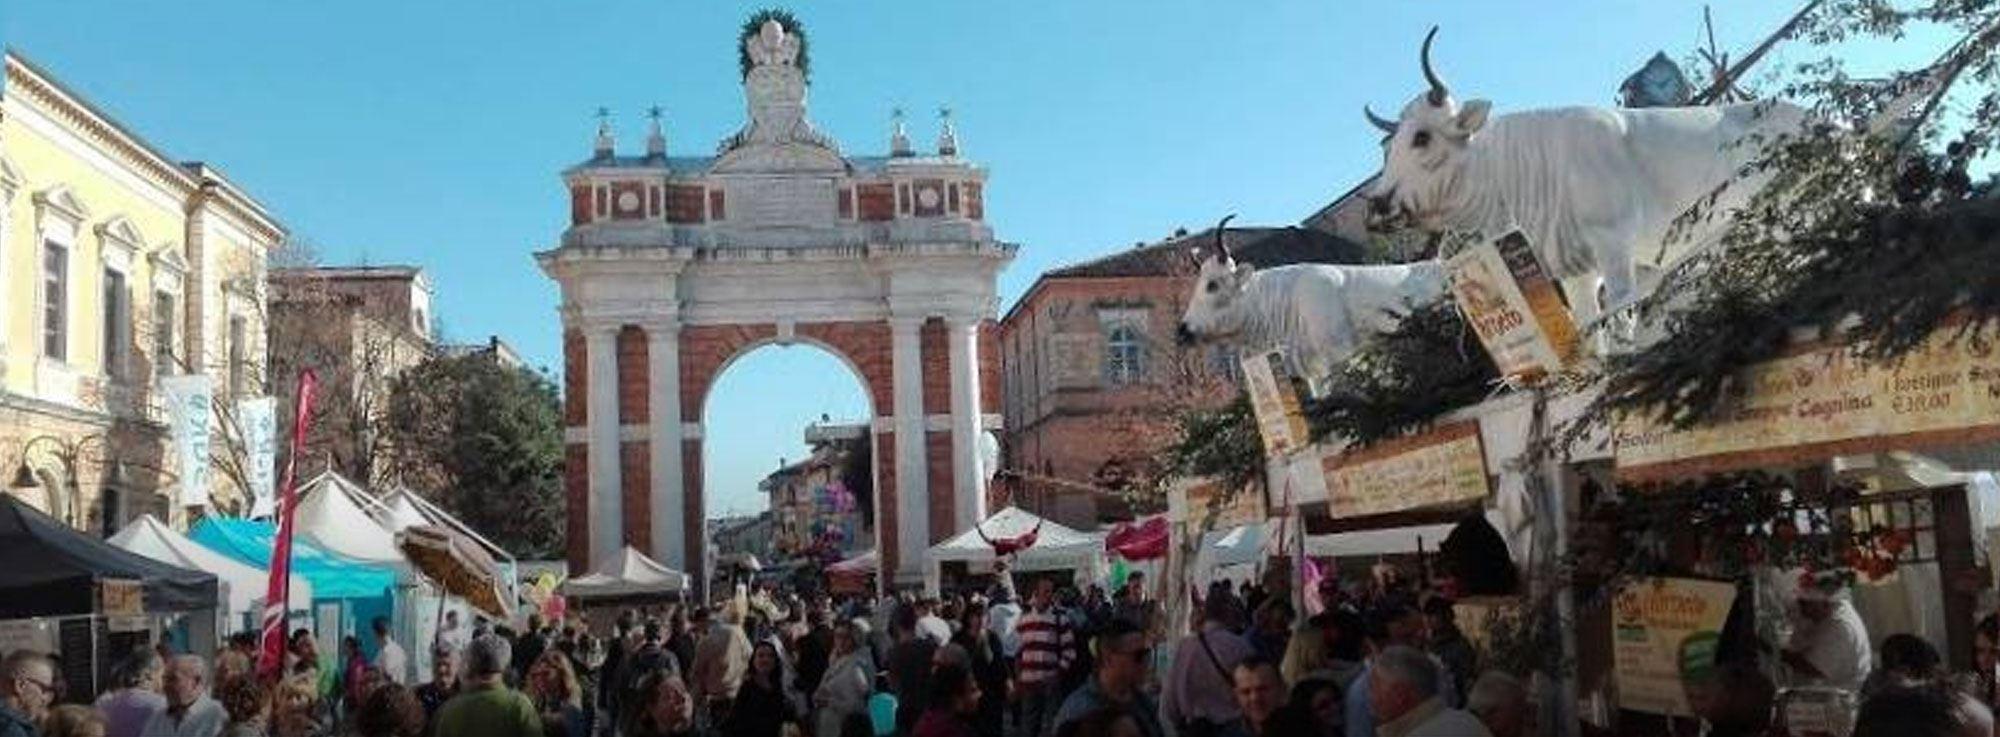 Martina Franca: Fiera di San Martino